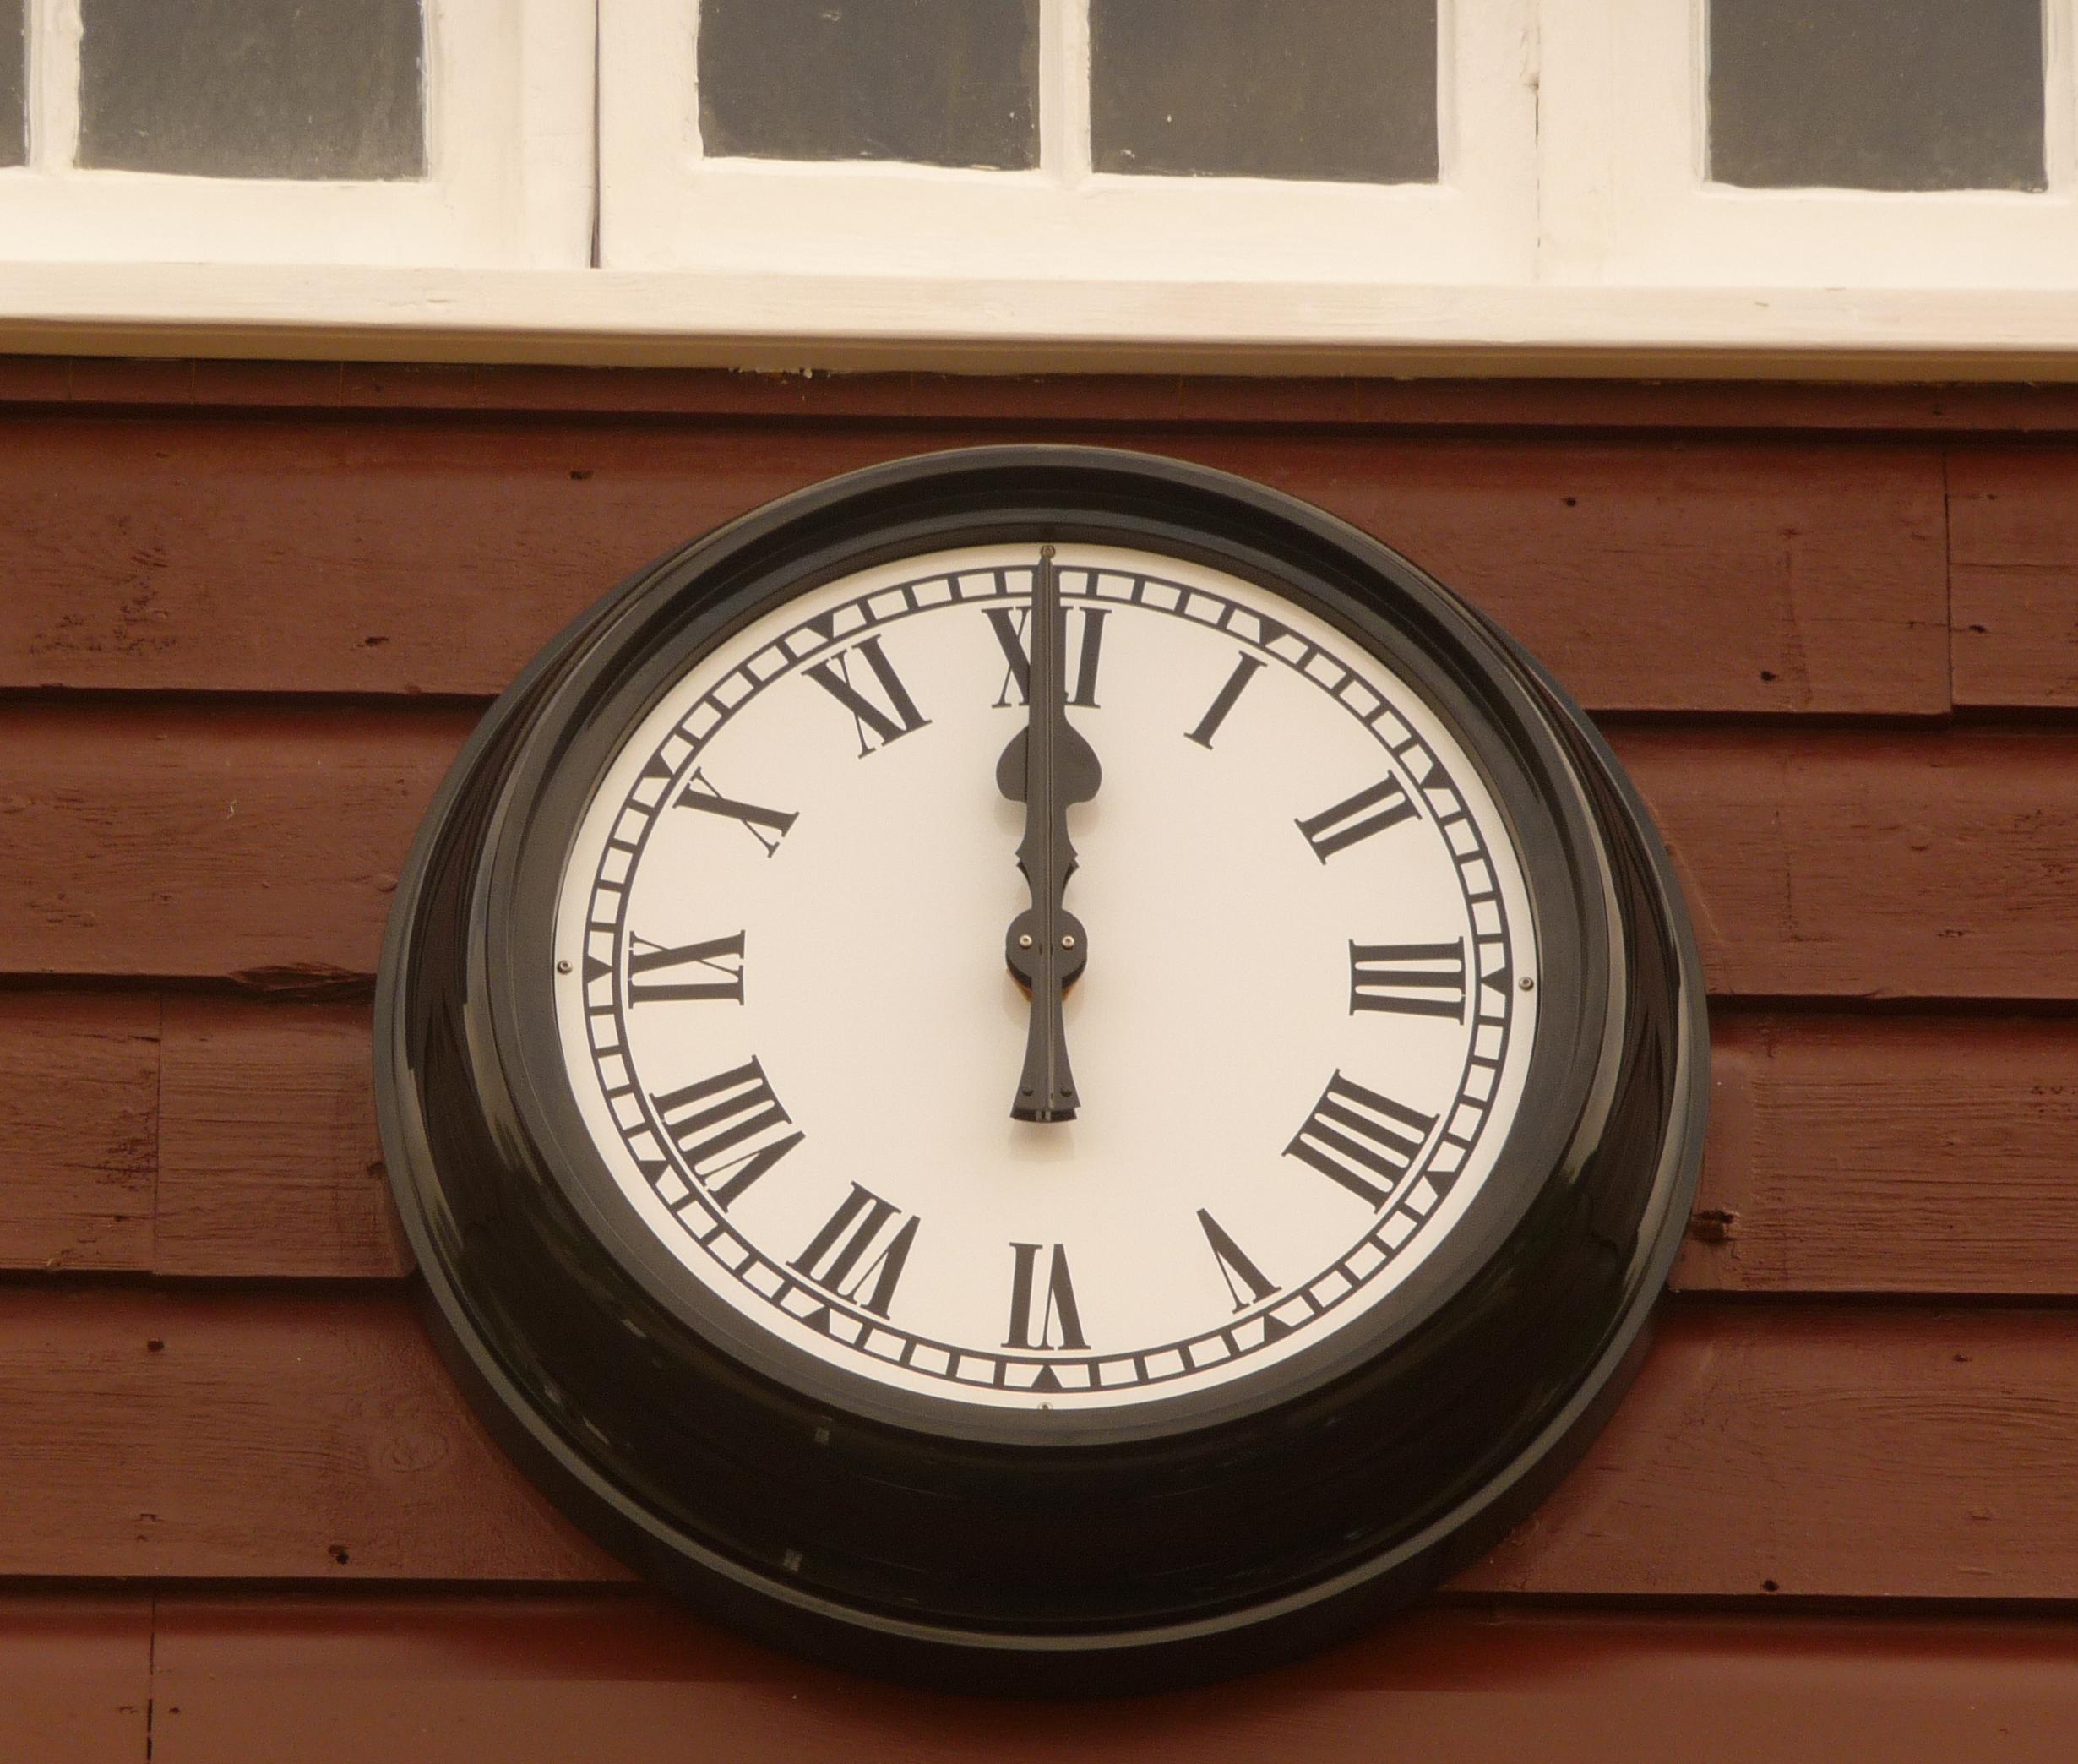 Cheltenham College Boat House Clock